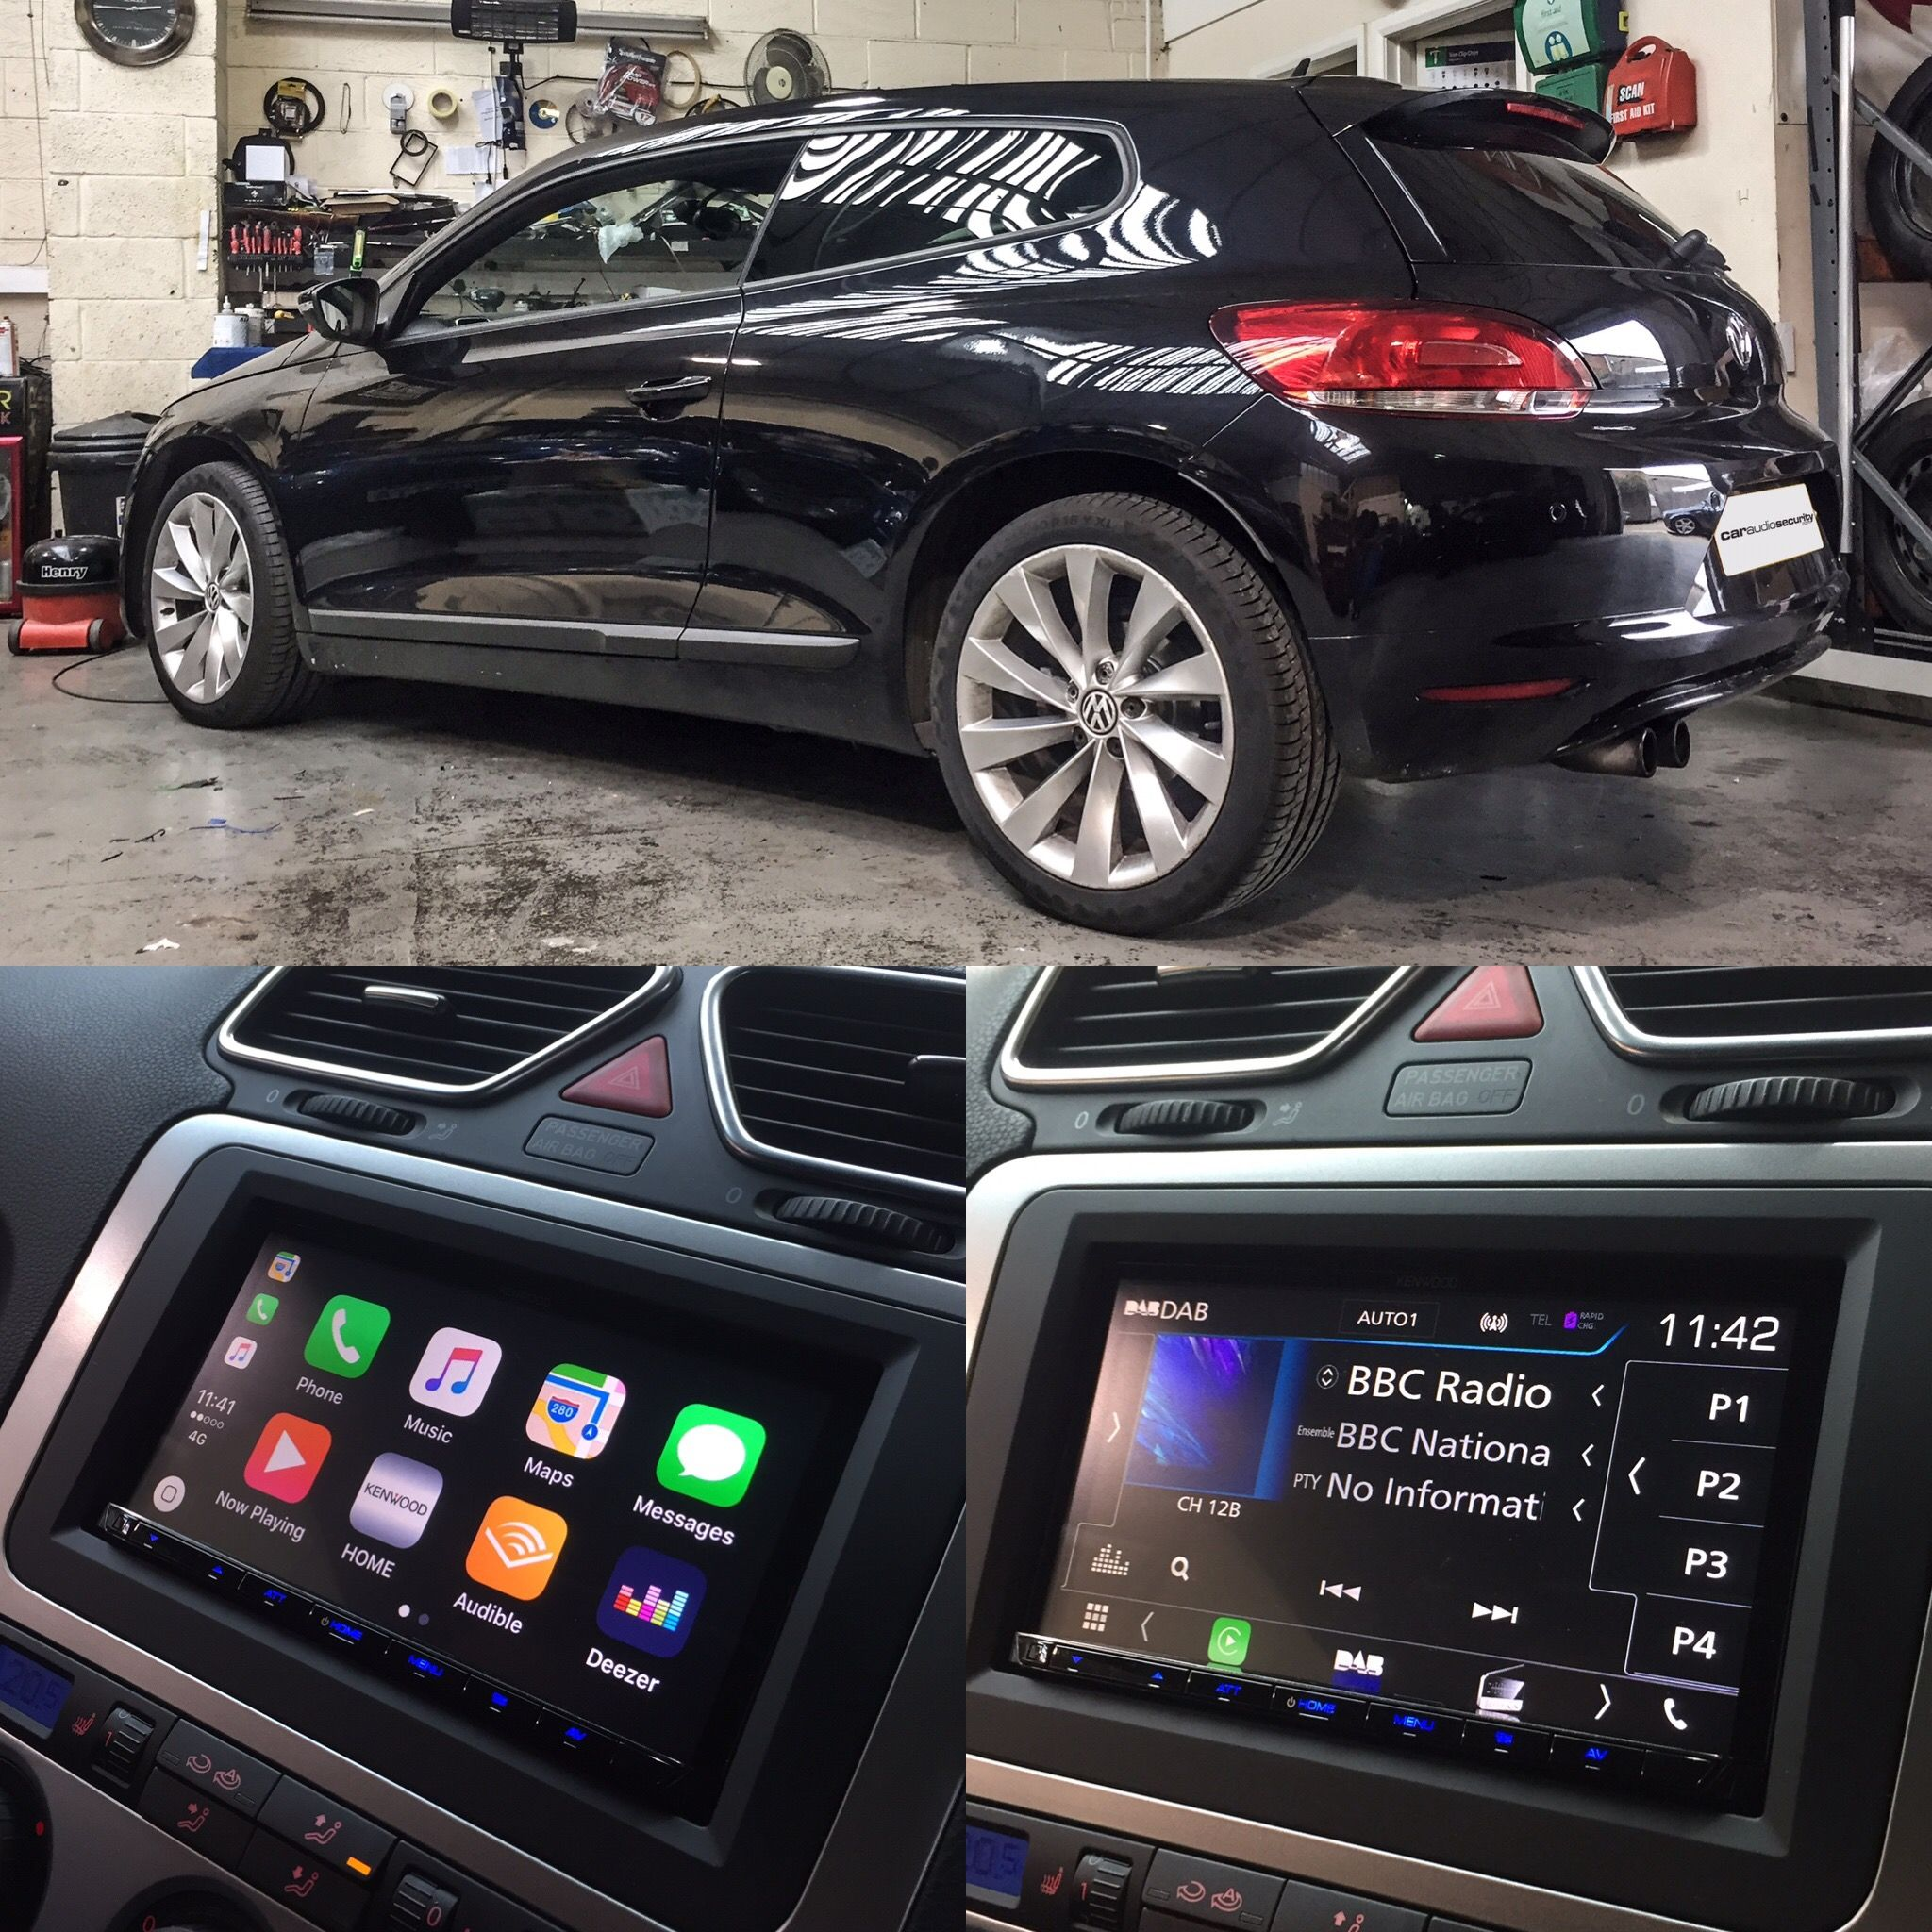 VW Scirocco Double Din Kenwood | Apple Carplay | Spotify